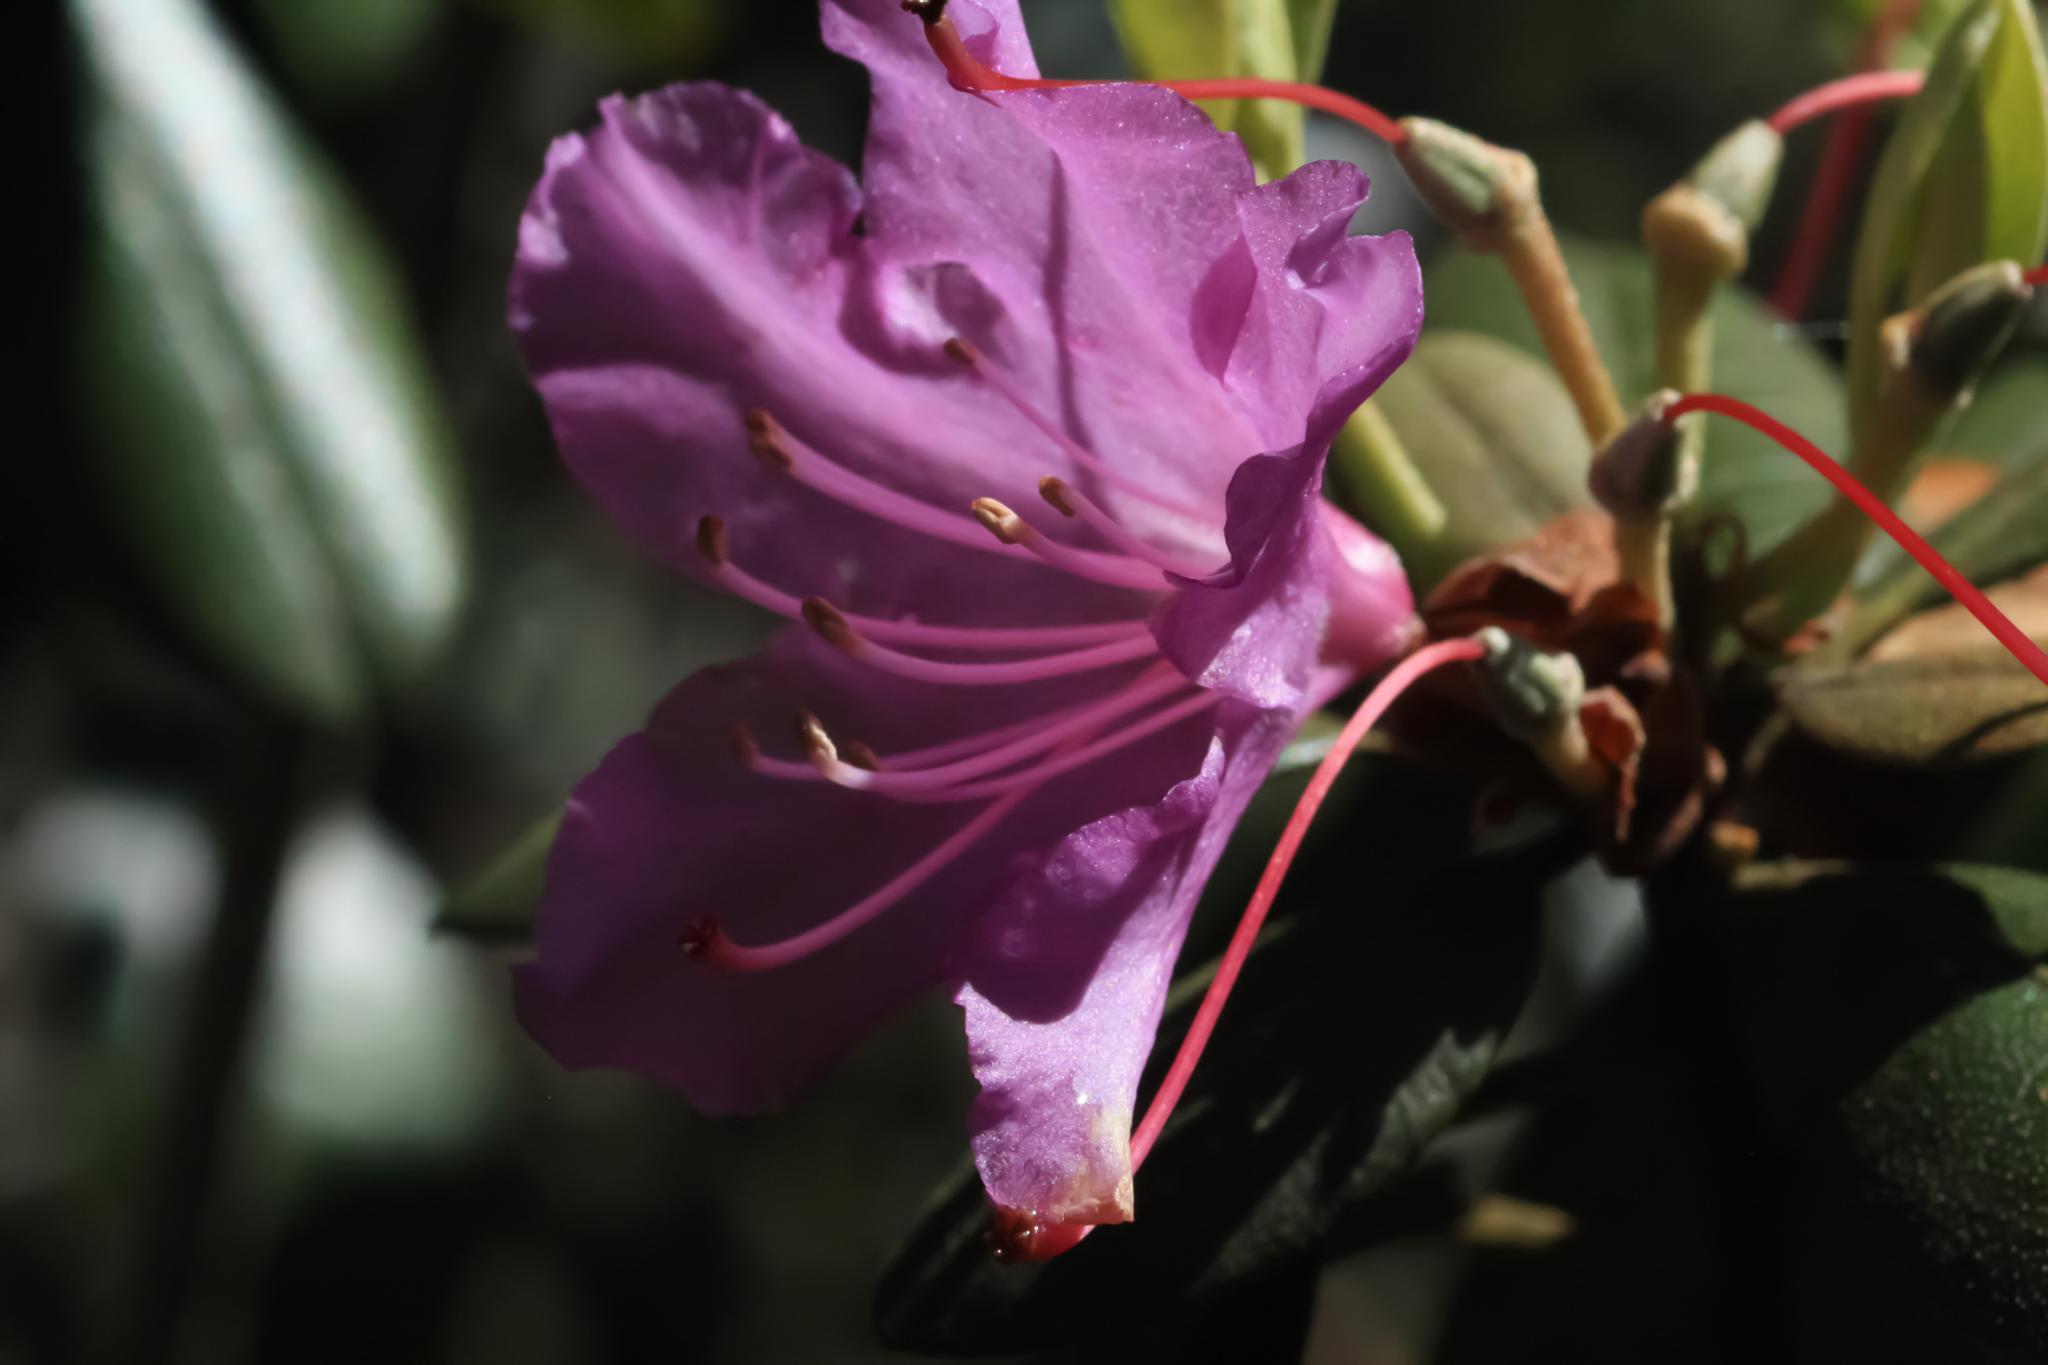 Flower in bloom by peyton0104